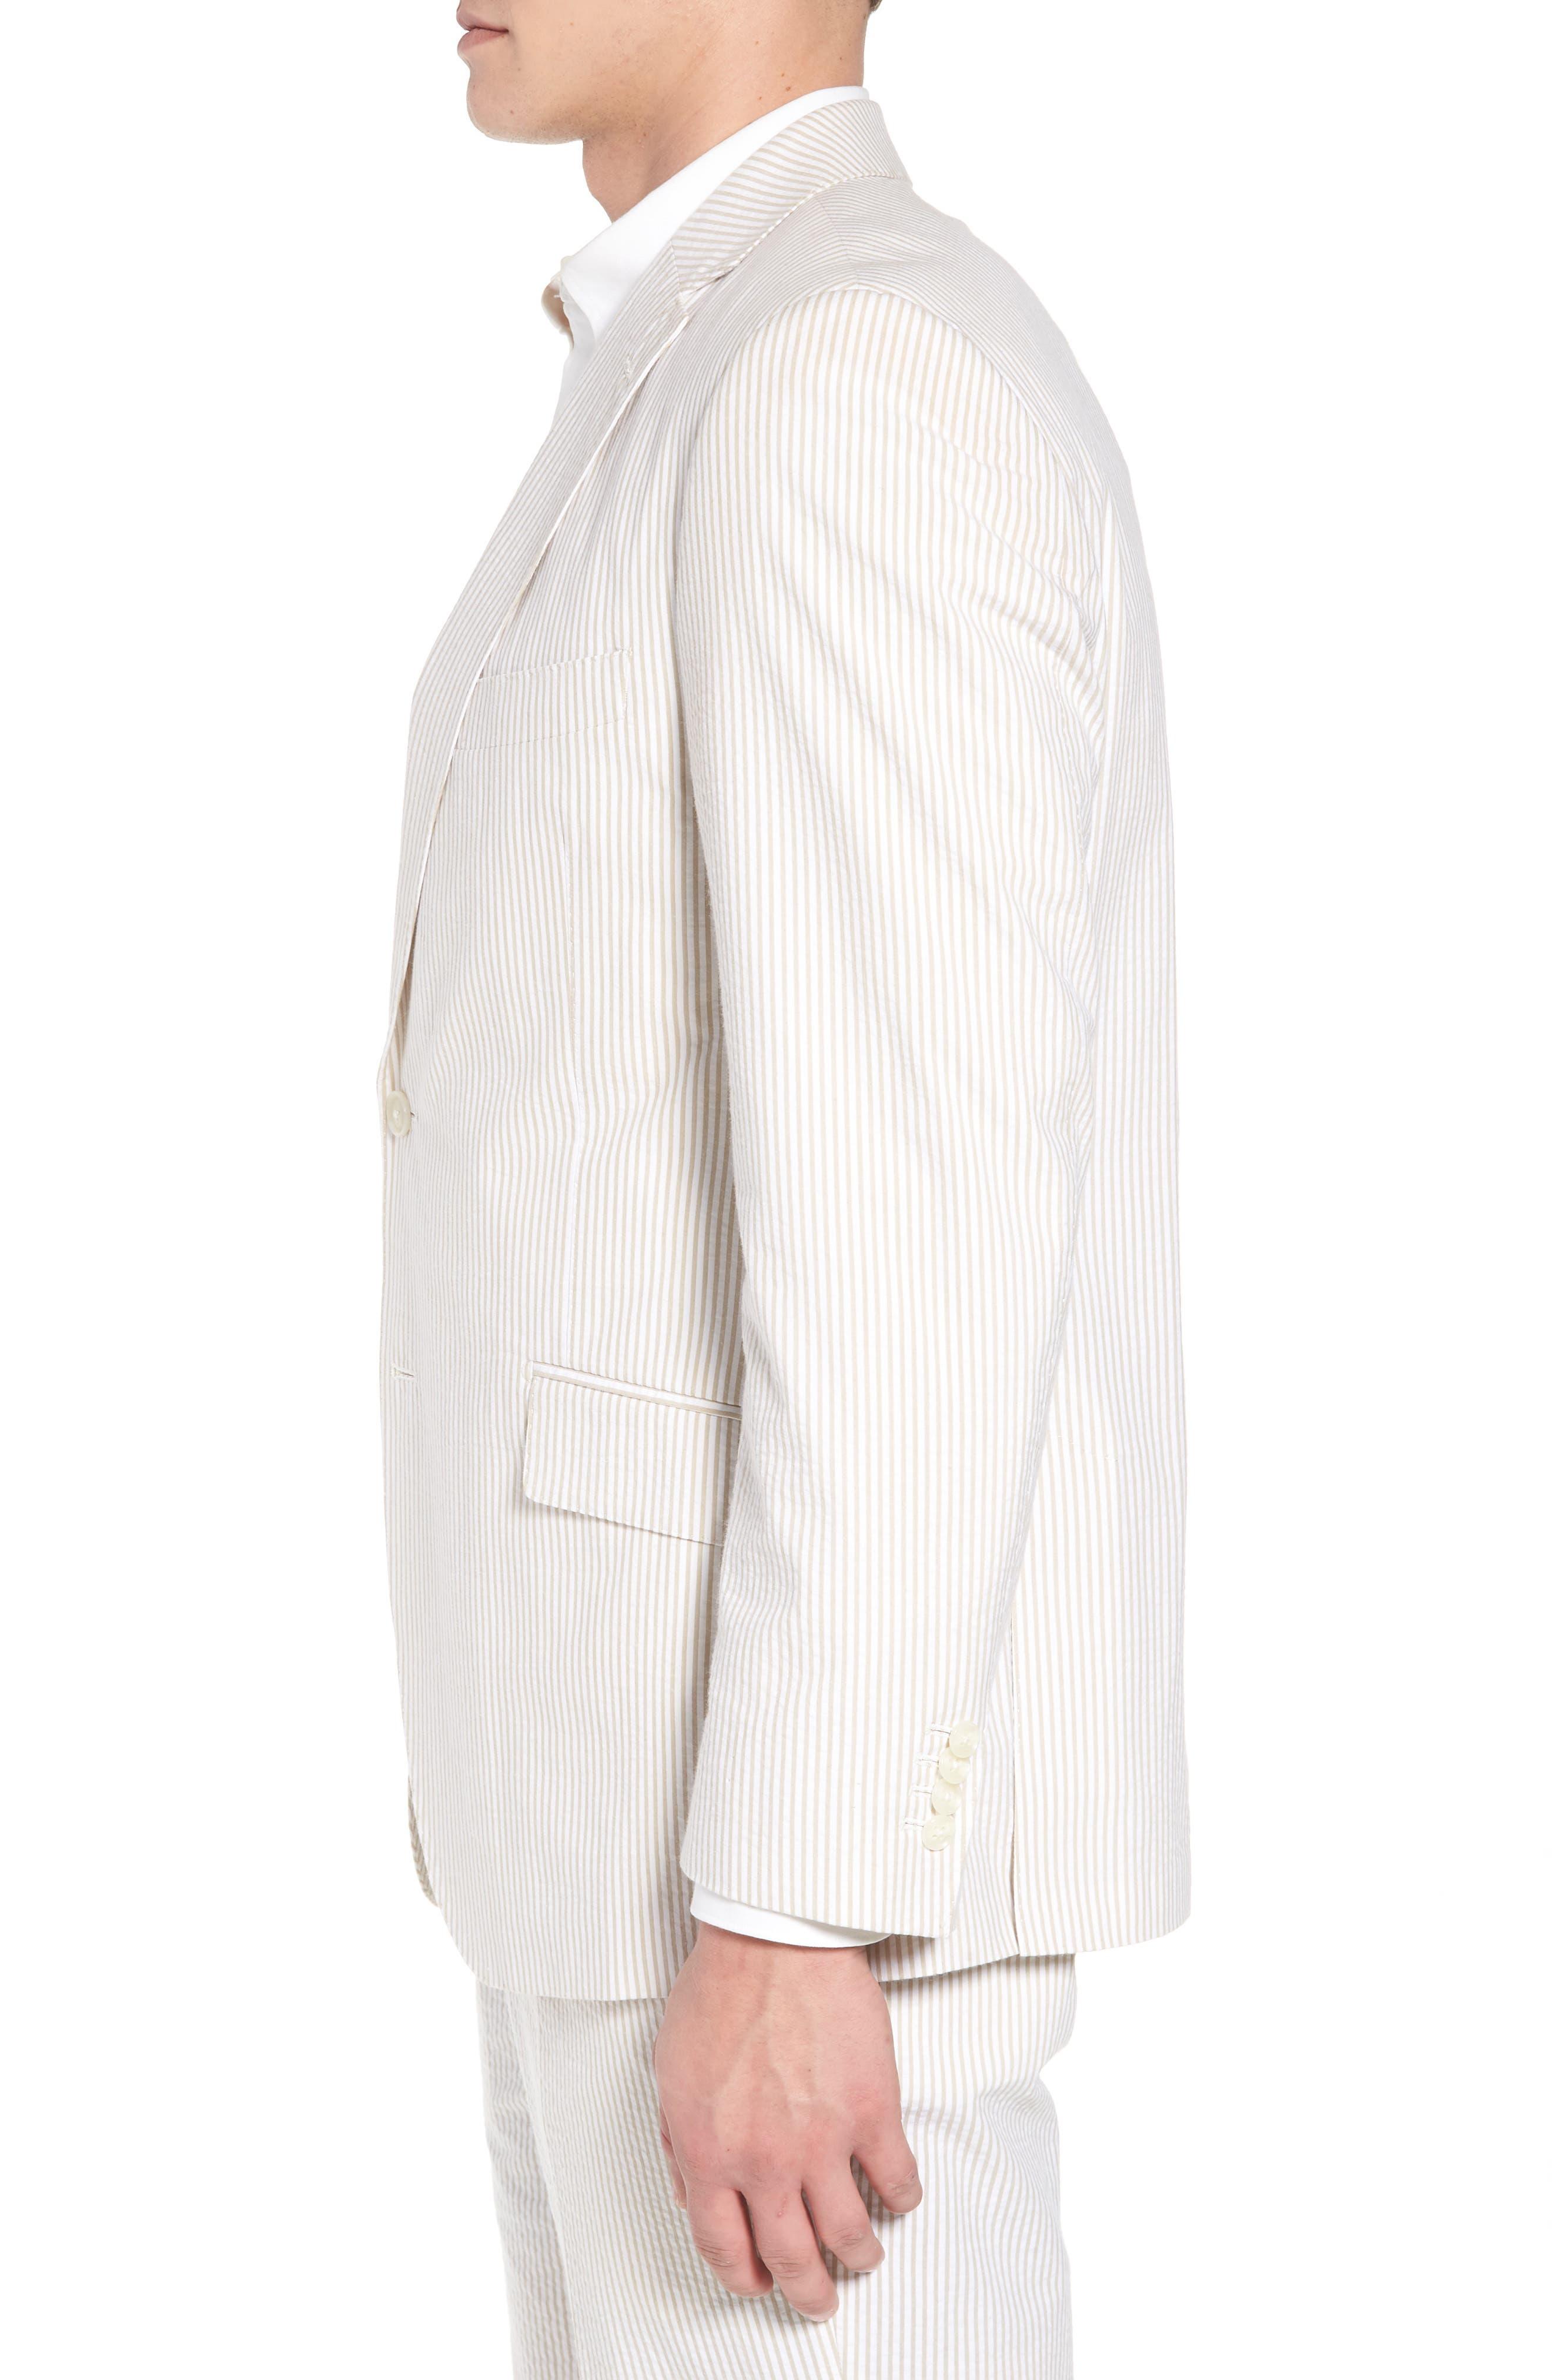 Jack AIM Classic Fit Seersucker Sport Coat,                             Alternate thumbnail 3, color,                             Tan And White